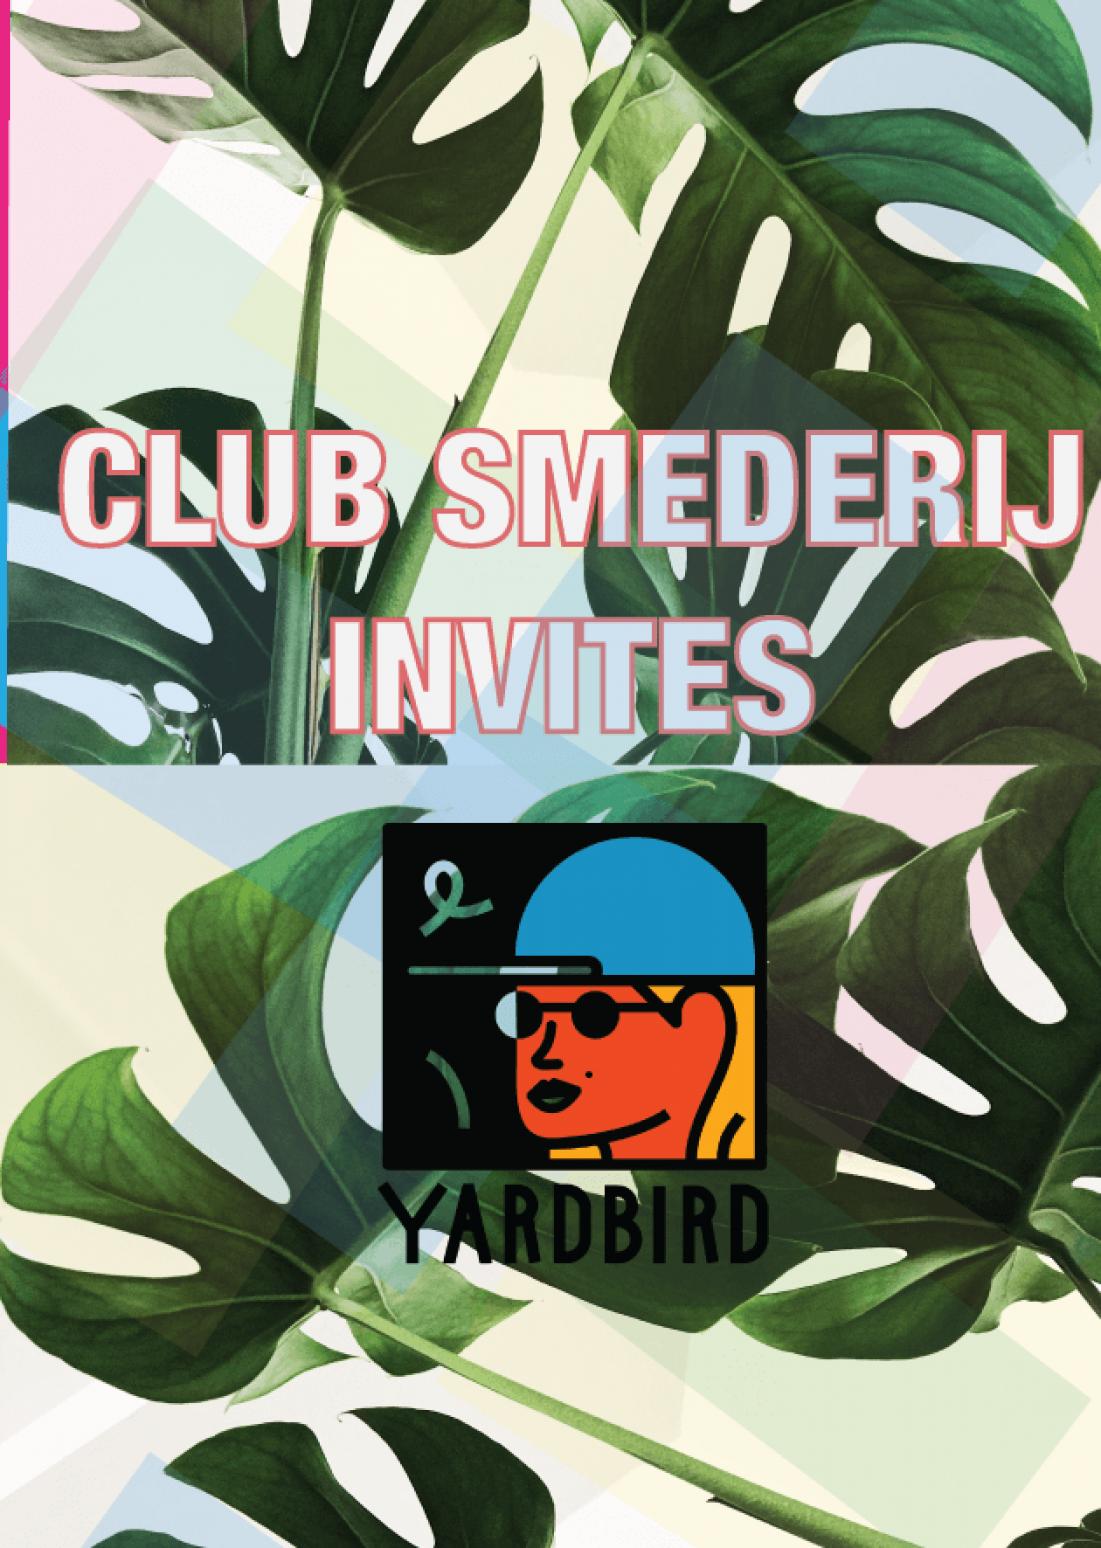 Club Smederij Invites Yardbird I Block Party